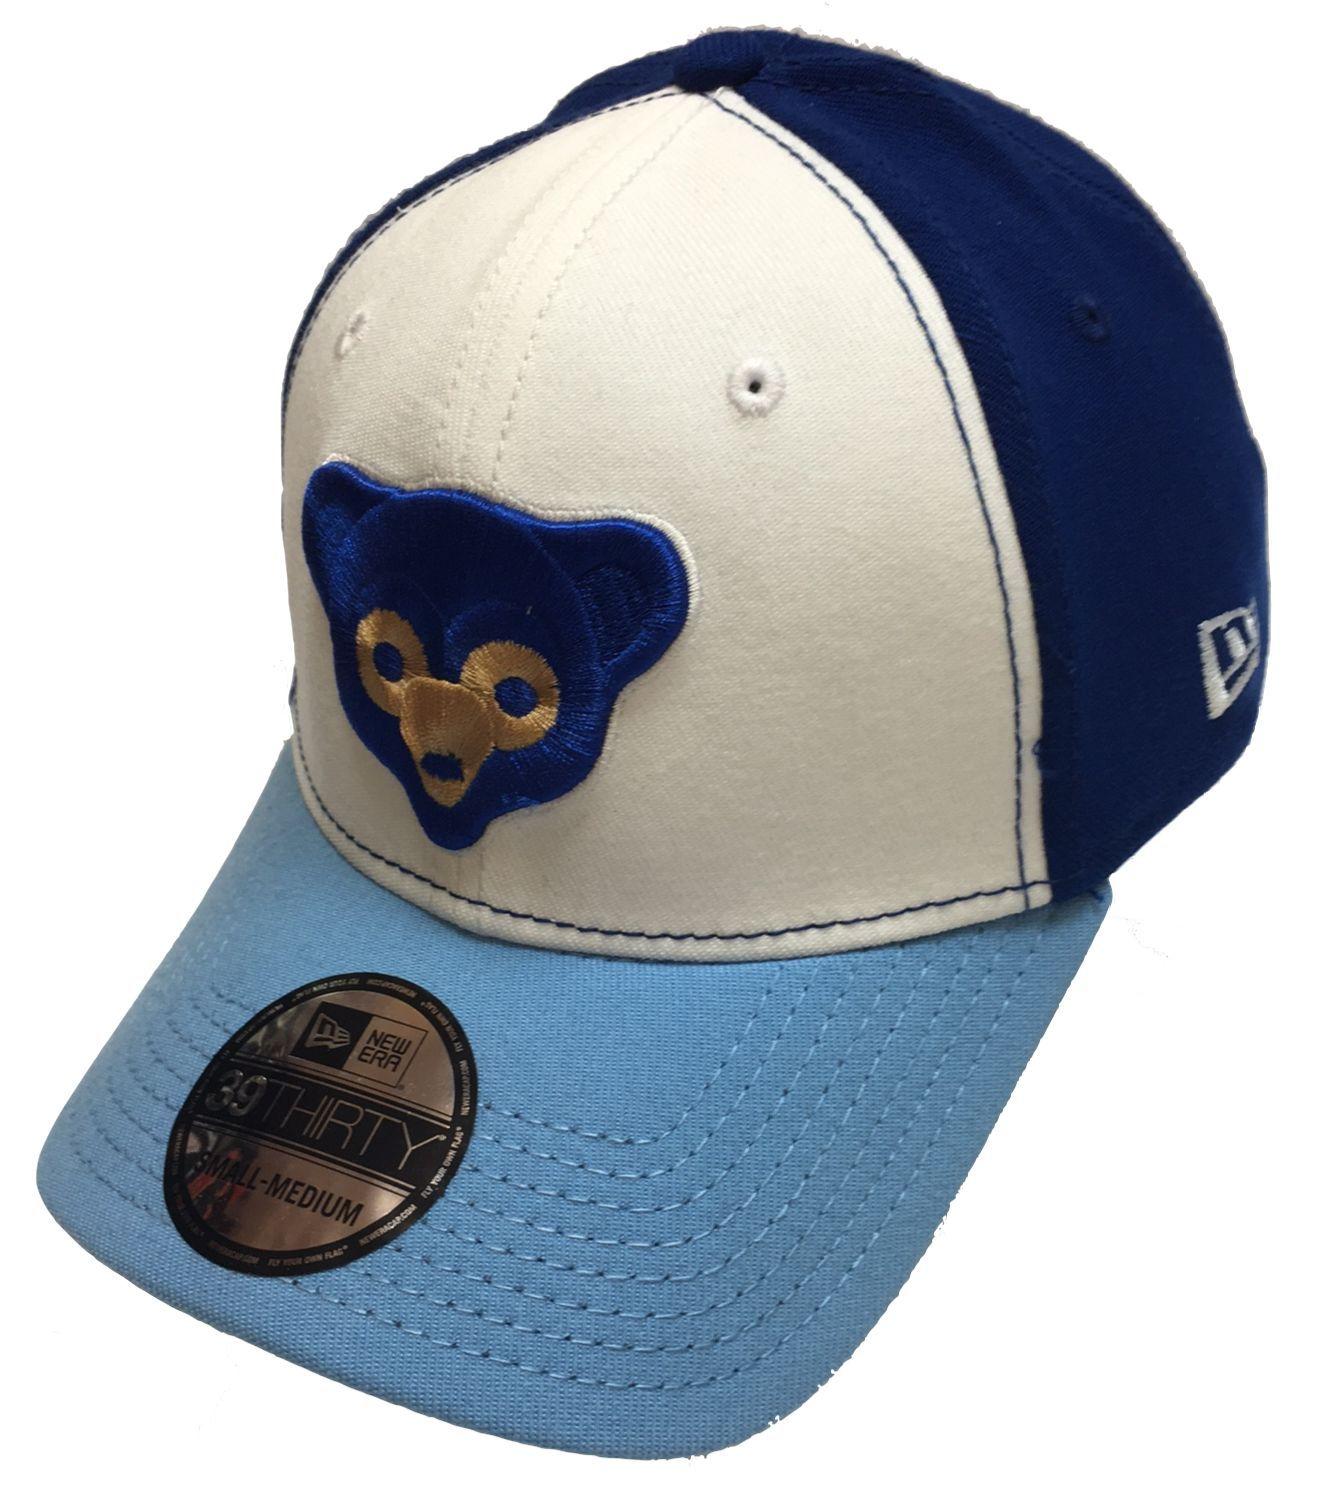 360b5d6b26317 Chicago Cubs 1969 Logo 39THIRTY Flex Fit Hat By New Era